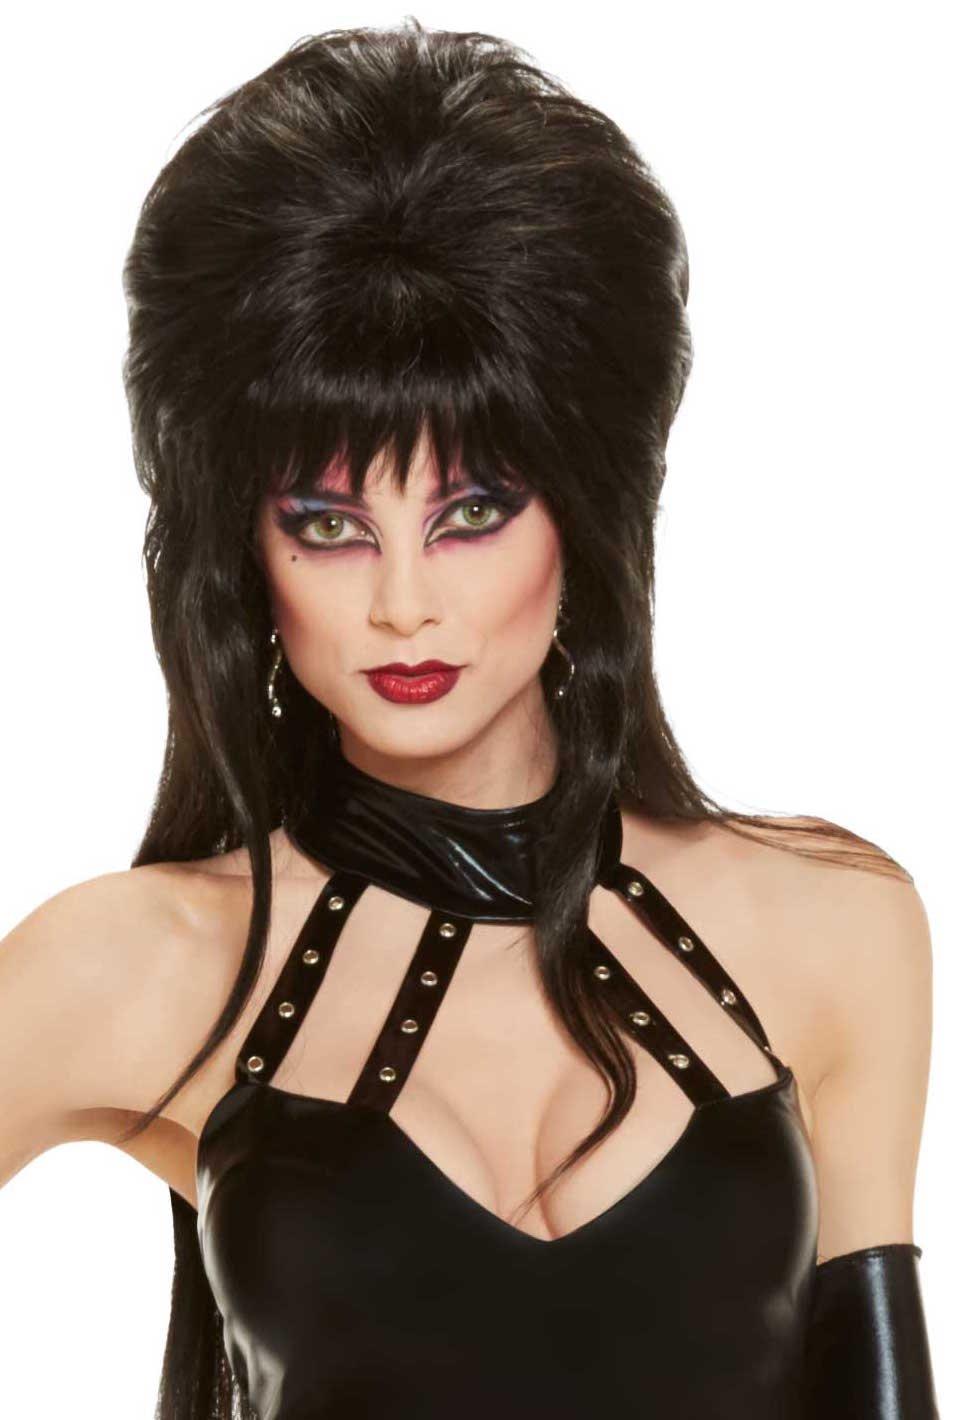 Rubie's Elvira Mistress Of The Dark Long Wig Black One Size Rubies Costumes - Apparel 51732